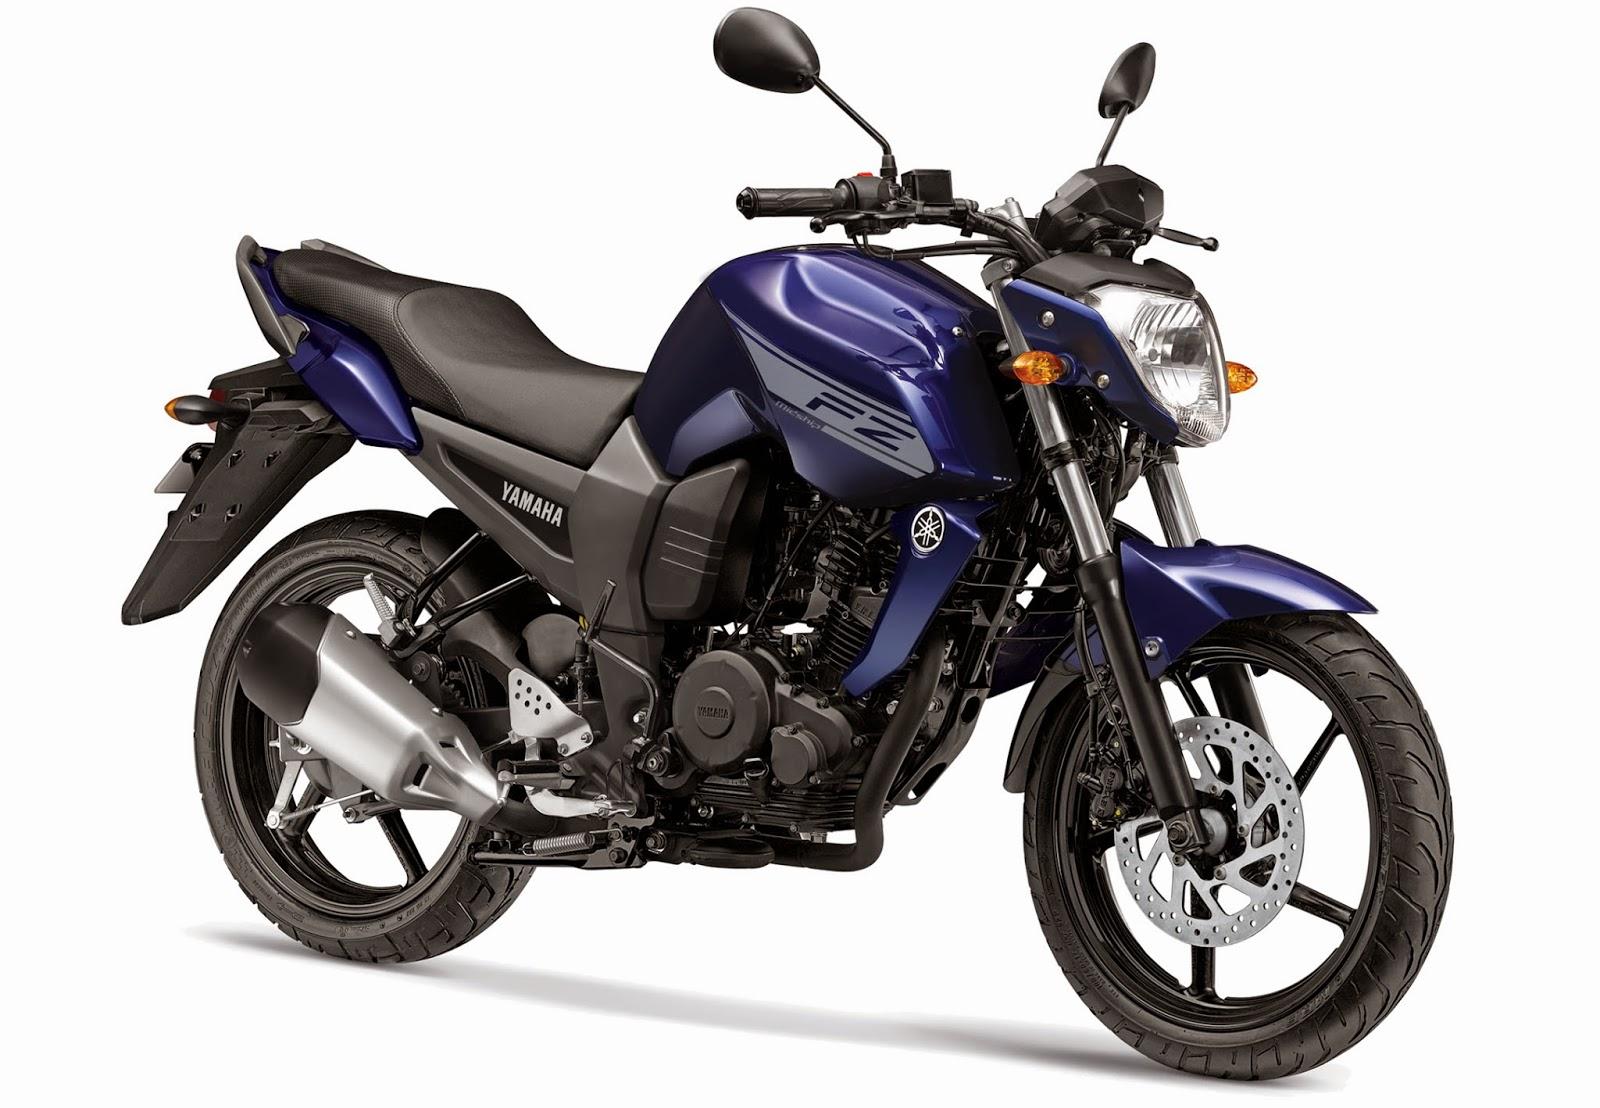 Yamaha FZ16 color brute blue